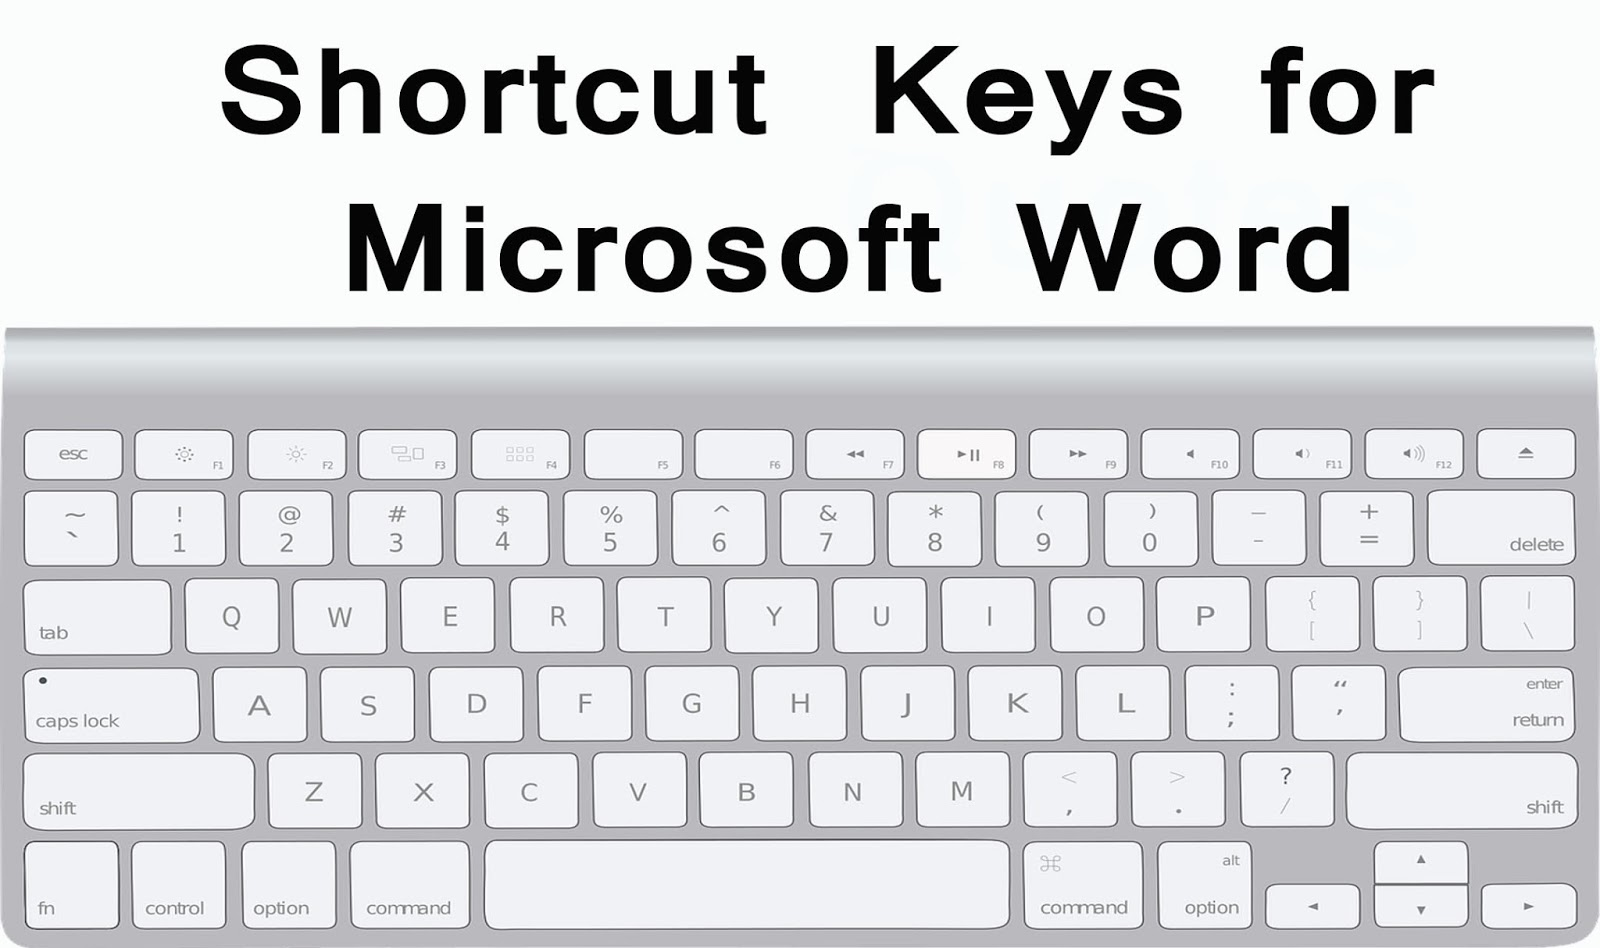 ms word 2007 shortcut keys pdf